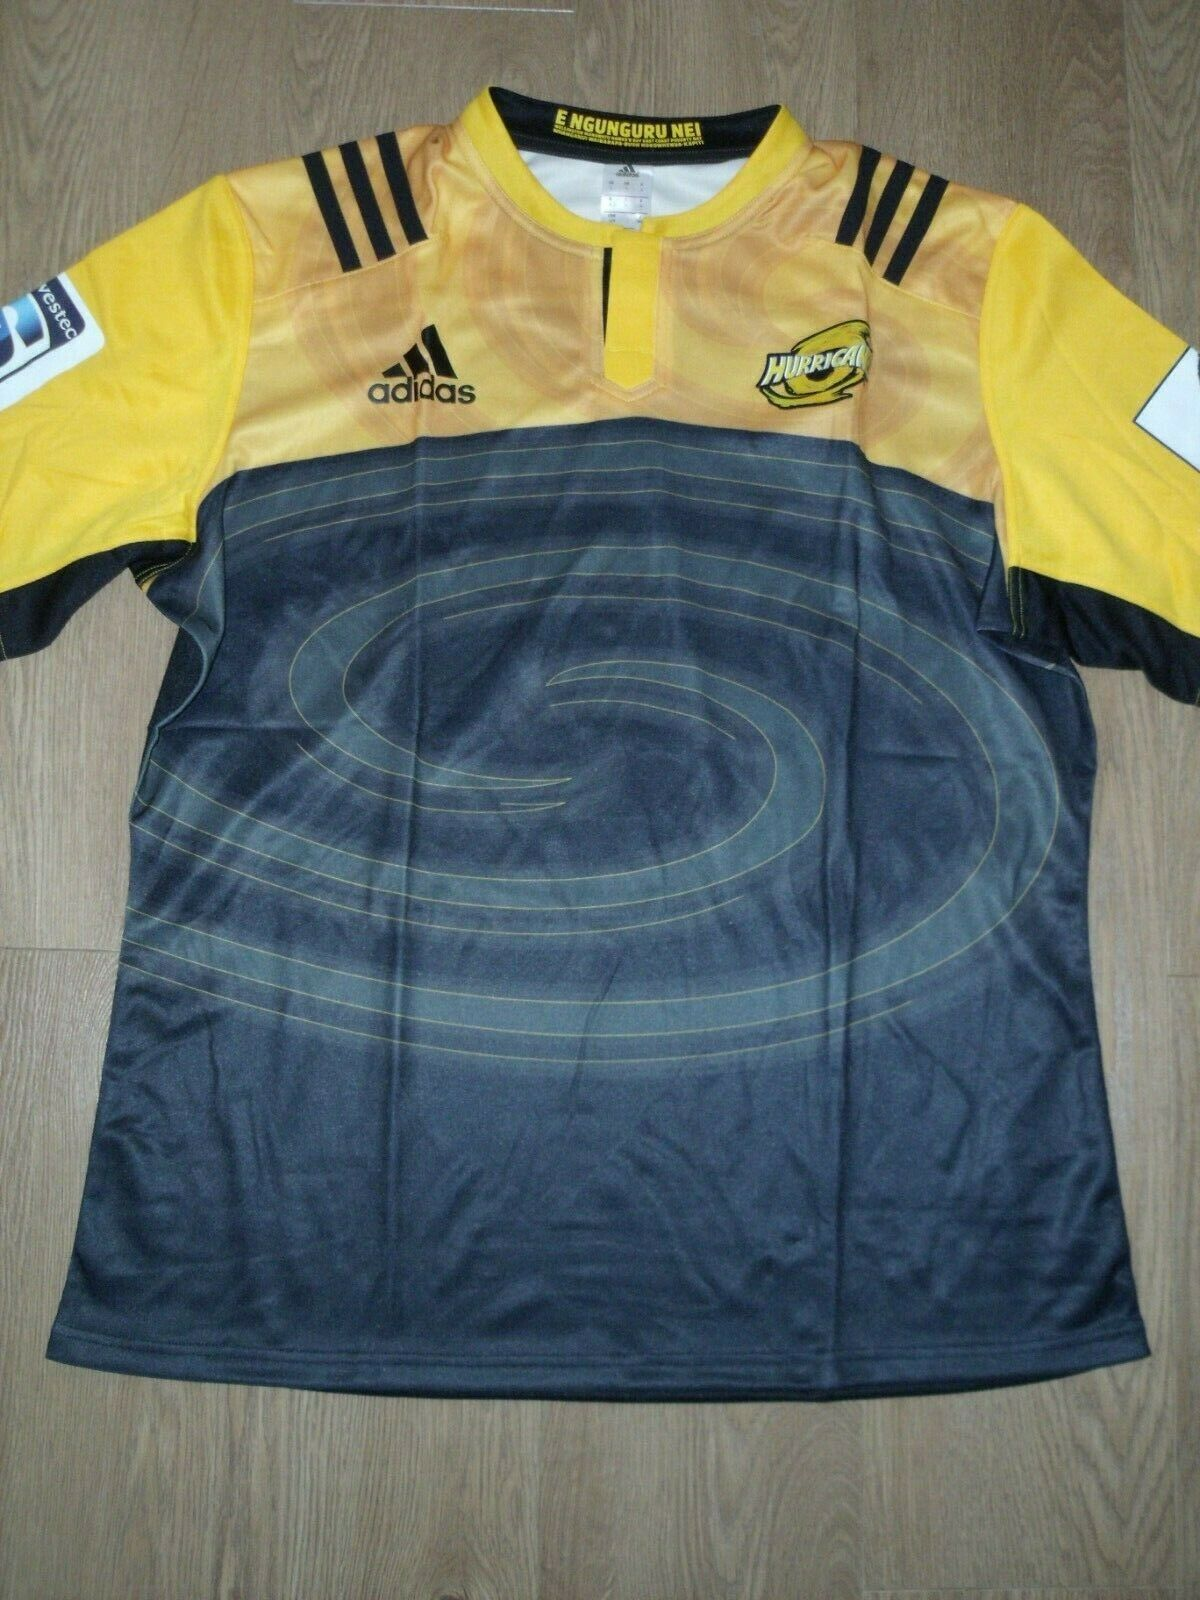 Hurricanes Neuseeland 2016 Heim Rugby Rugby Rugby Hemd Trikot Gelb Schwarz XXXL 3XL Neu 25d3d6